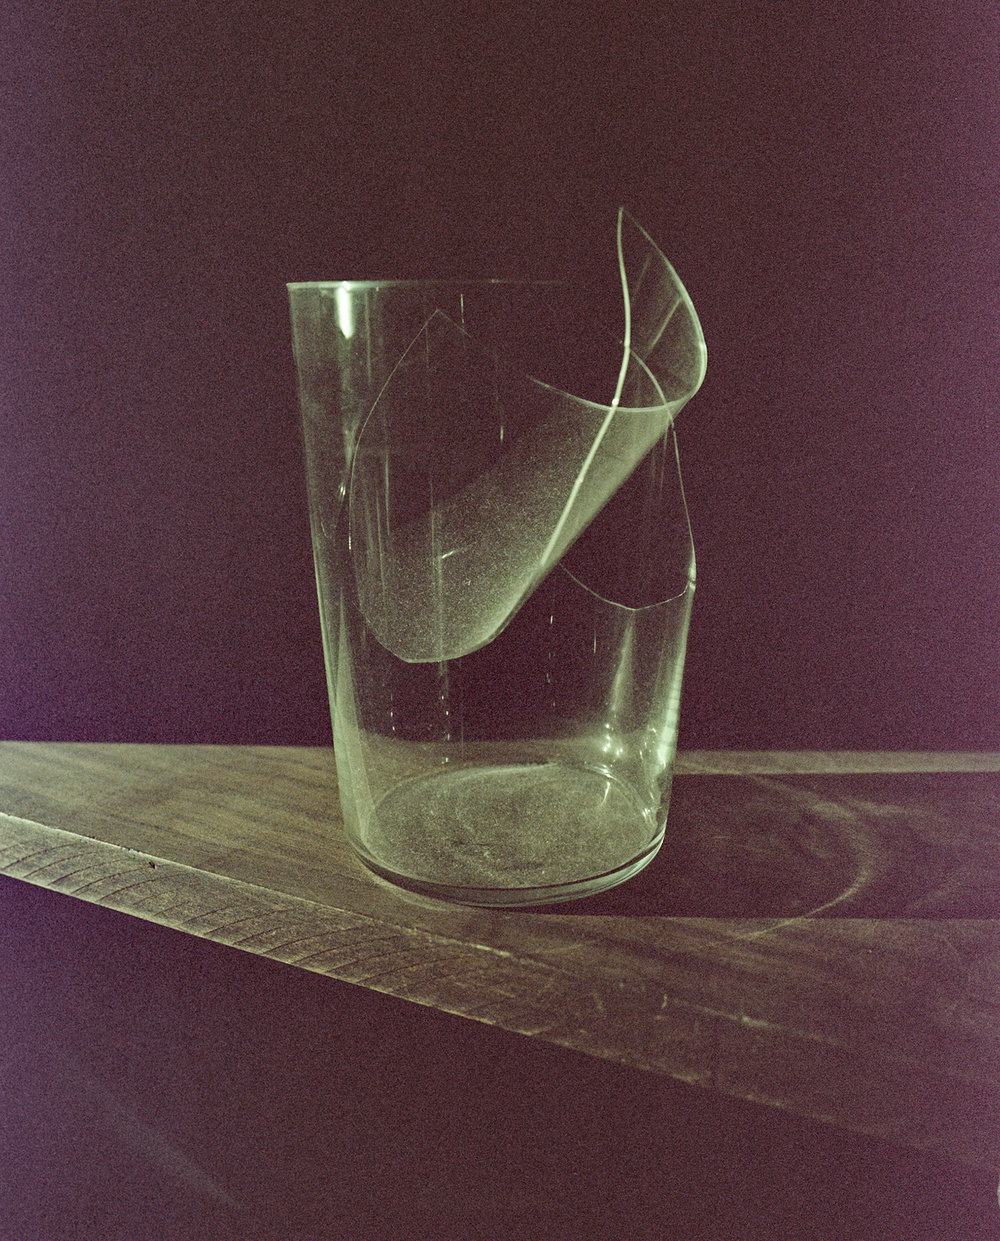 Broken Glass #45